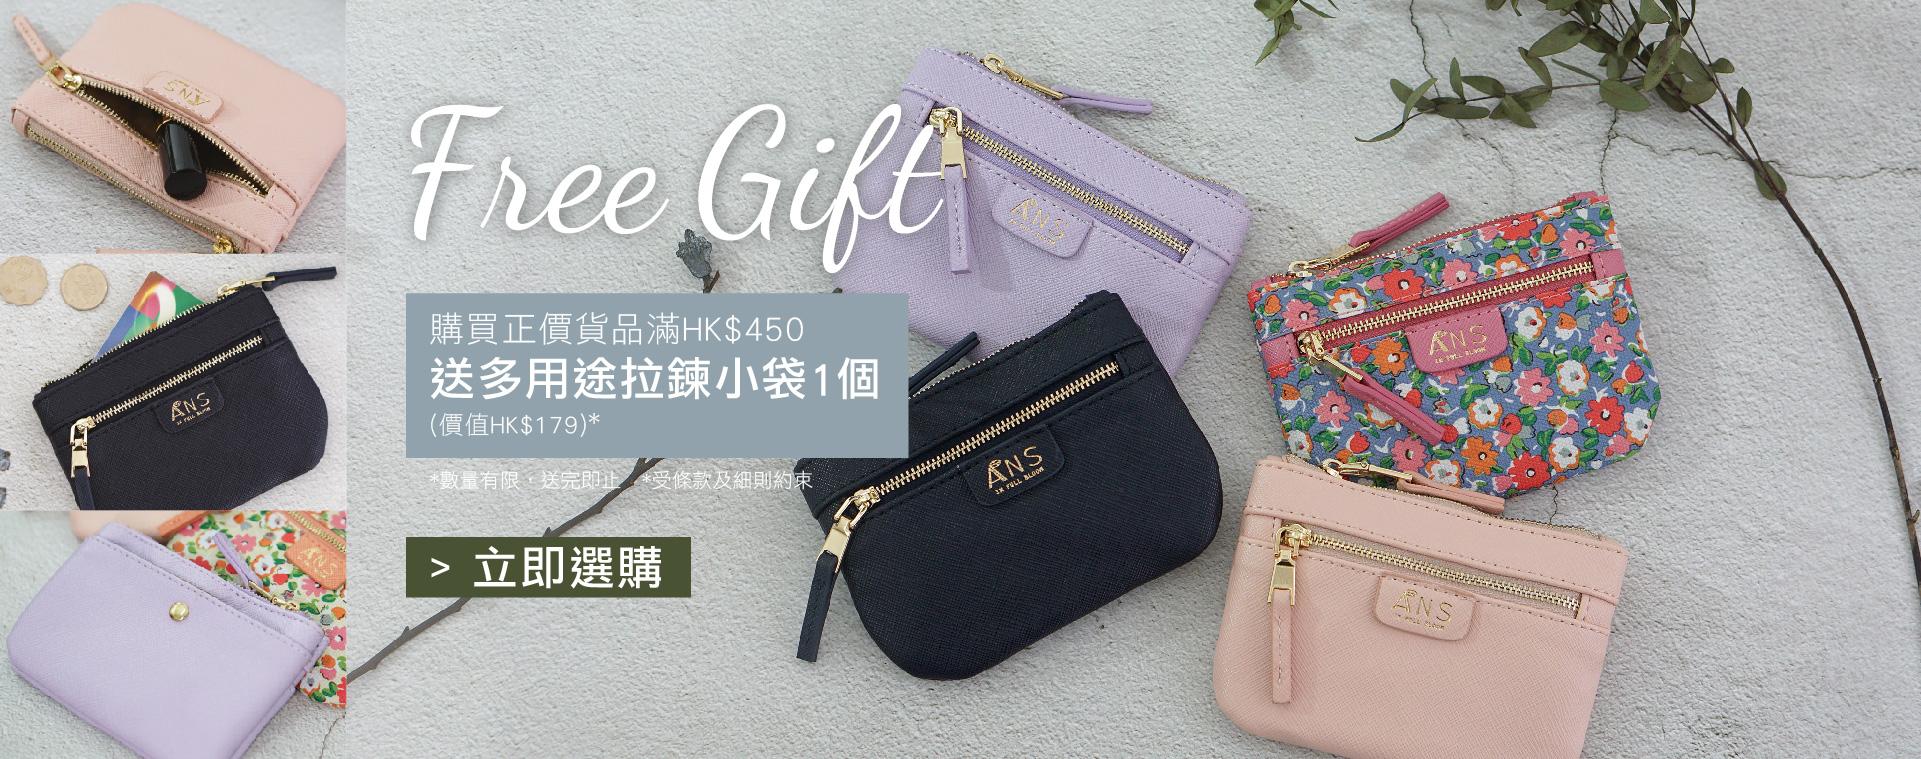 Free Gift,Giveaway 贈品,送禮